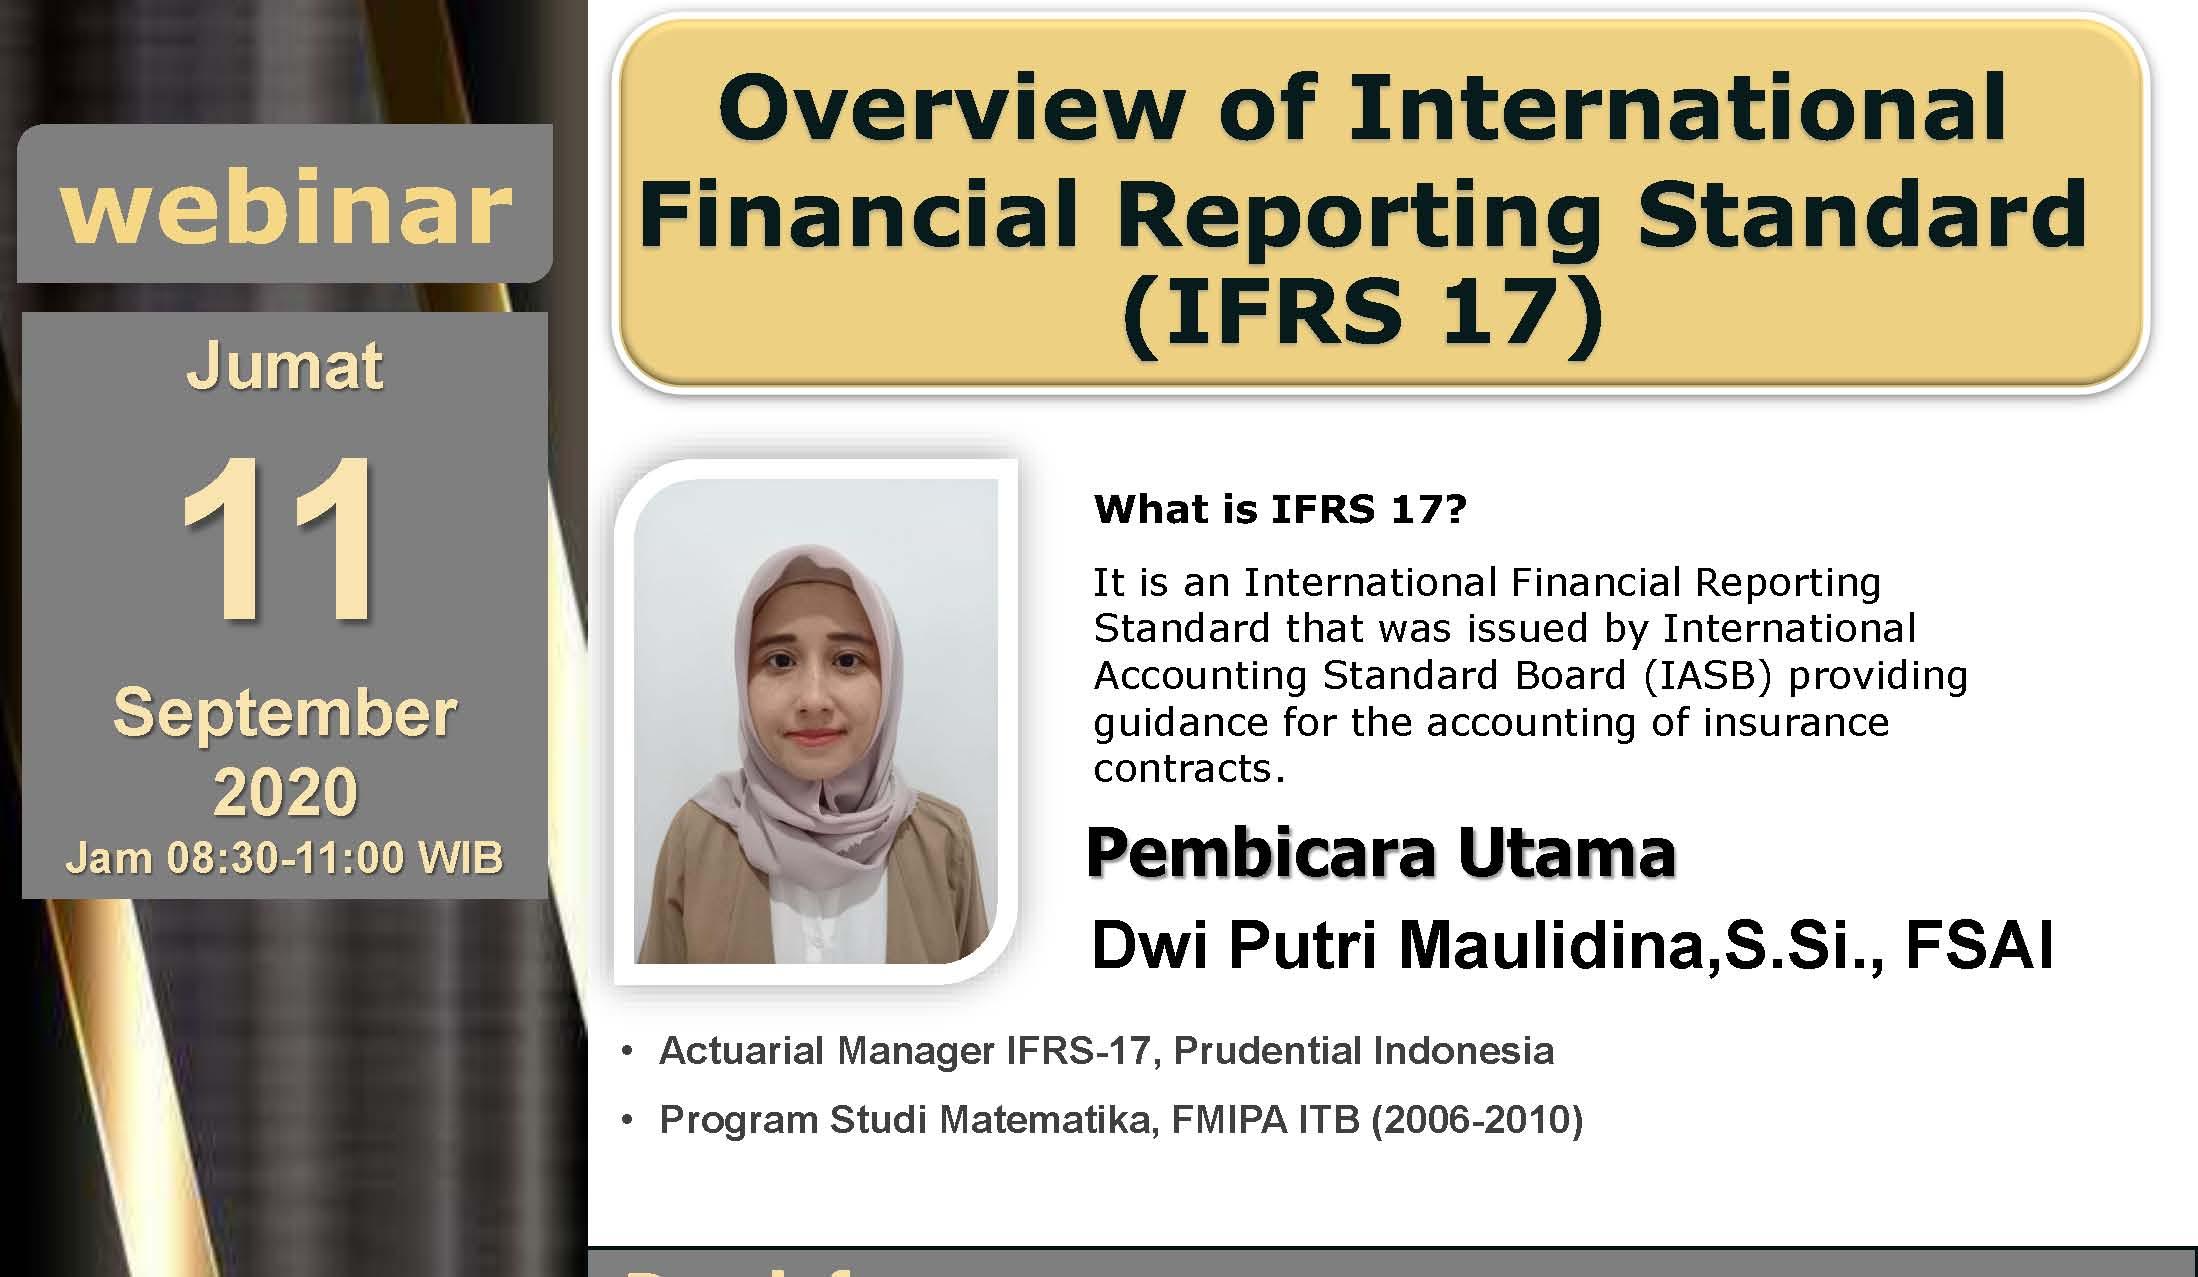 Webinar Overview of International Financial Reporting Standard (IFRS-17)